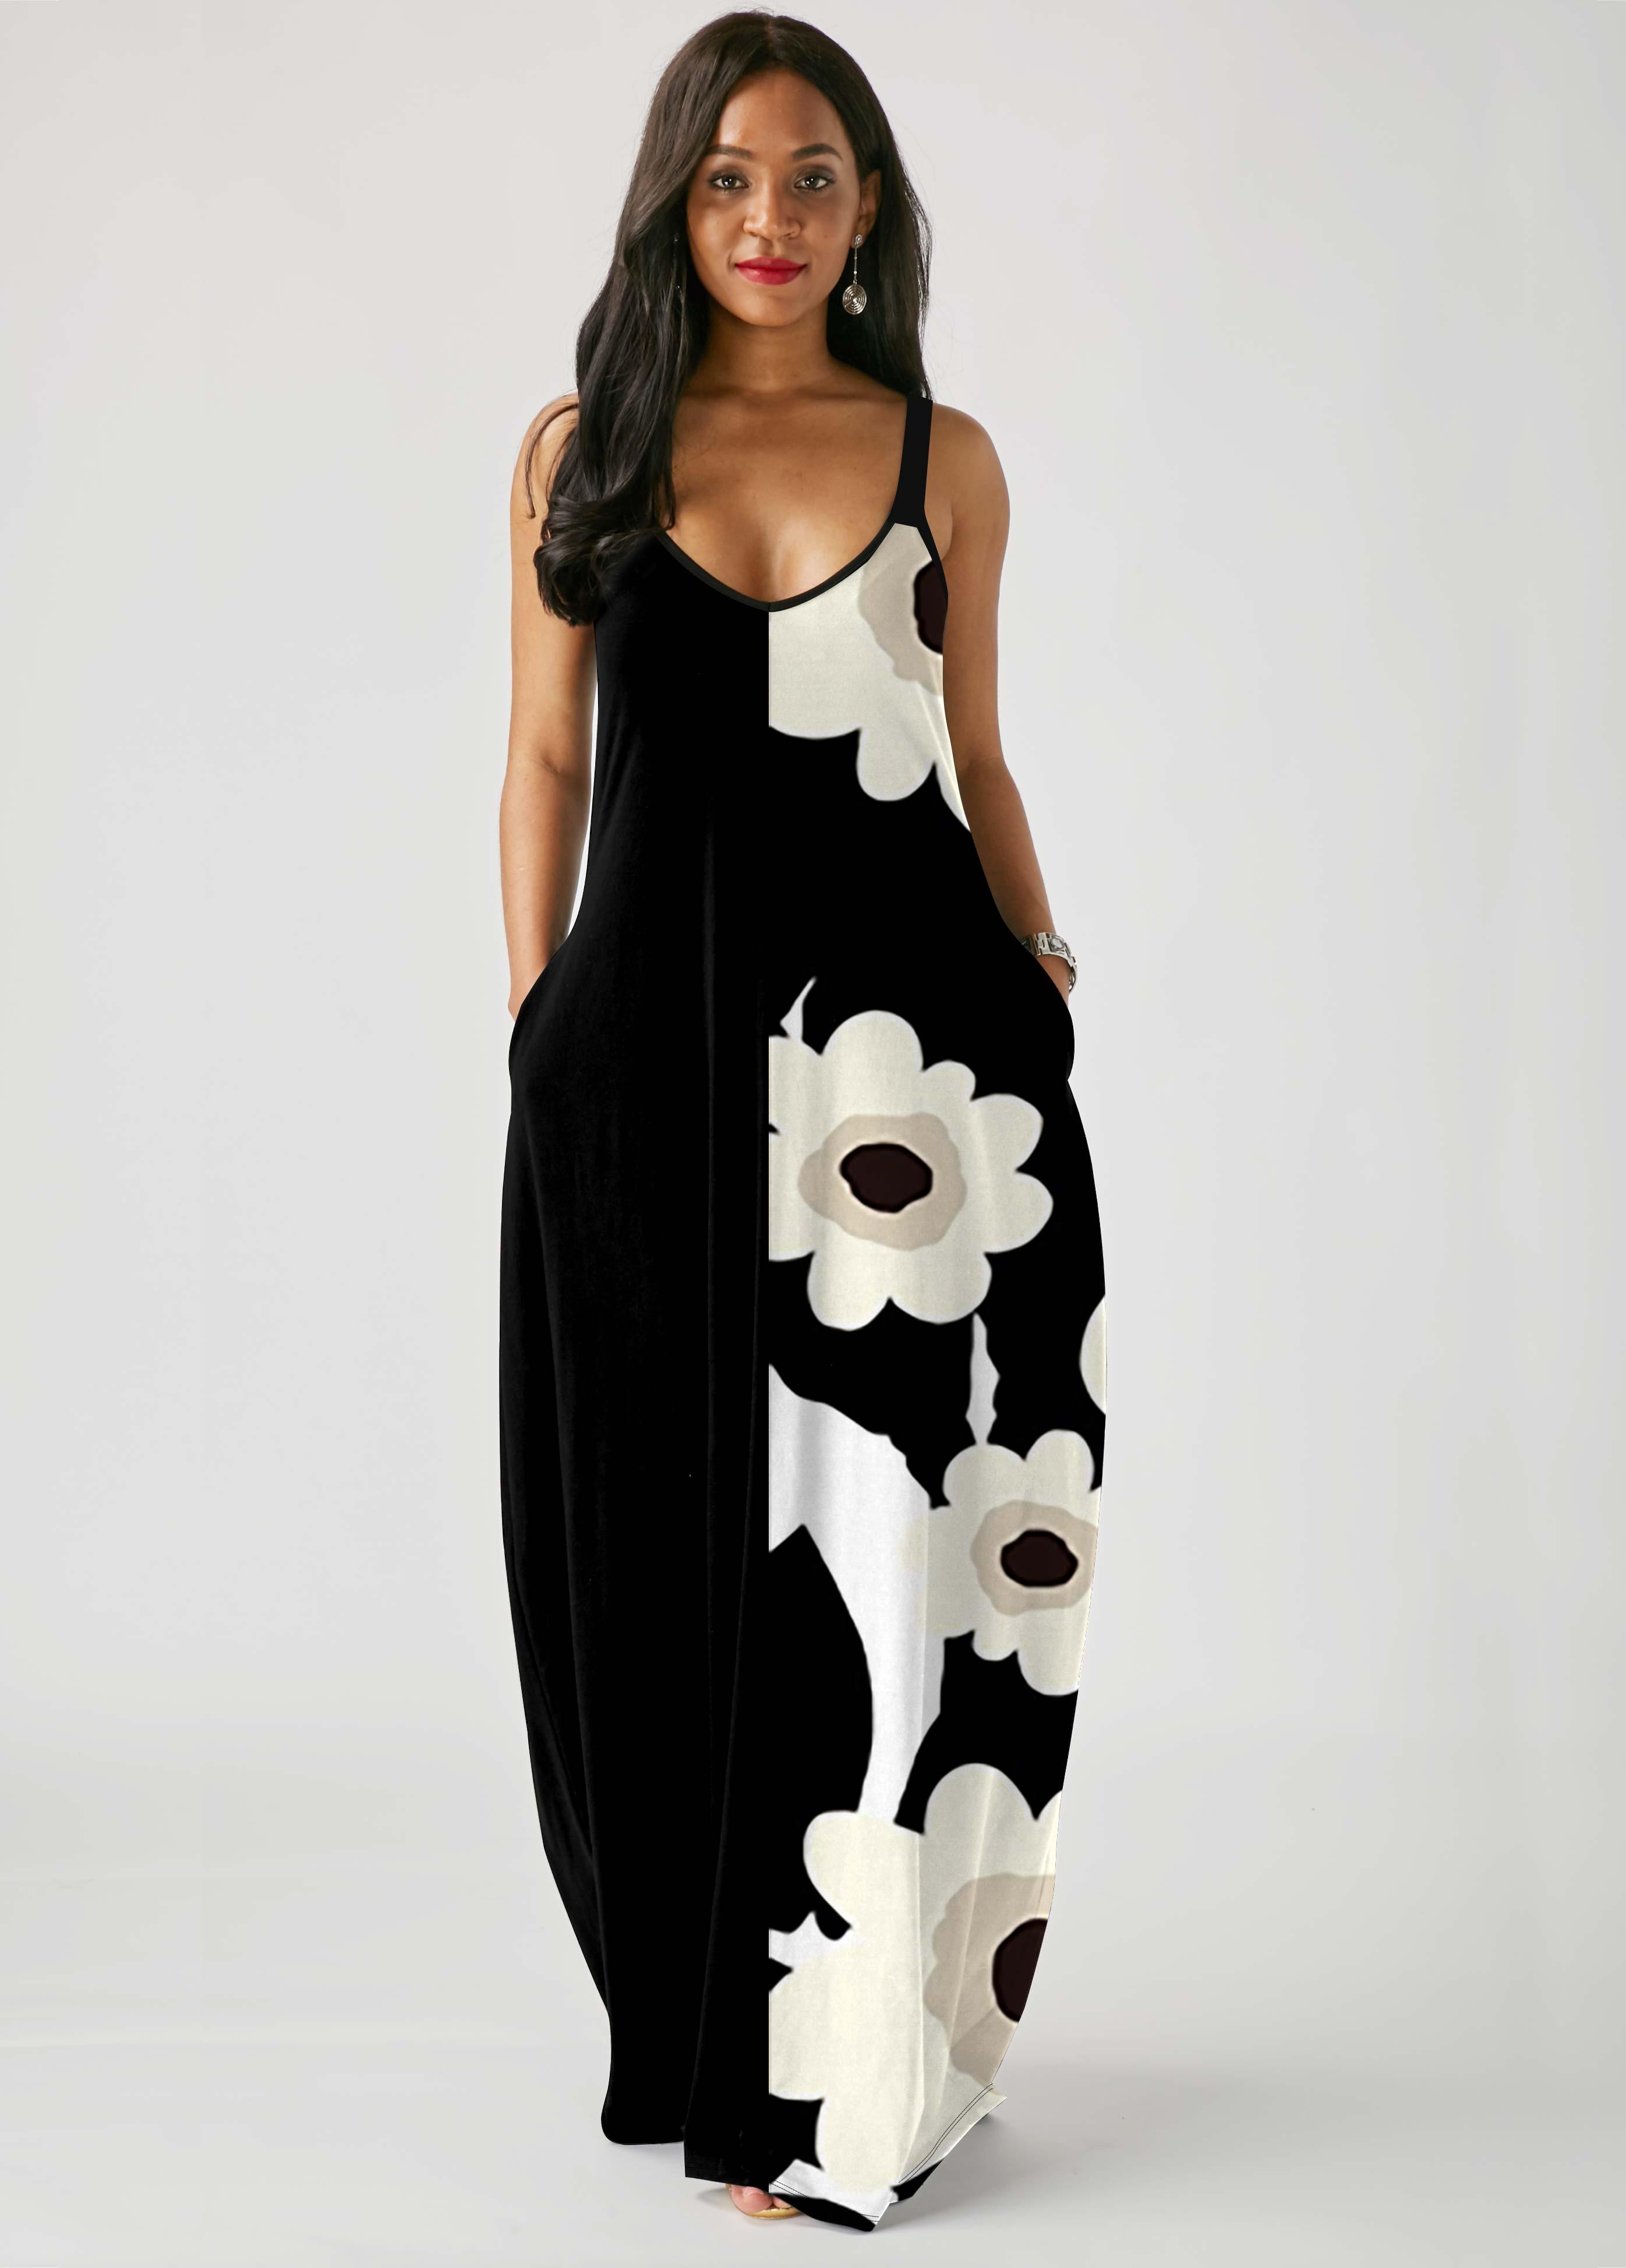 Floral Print Spaghetti Strap Pocket Dress